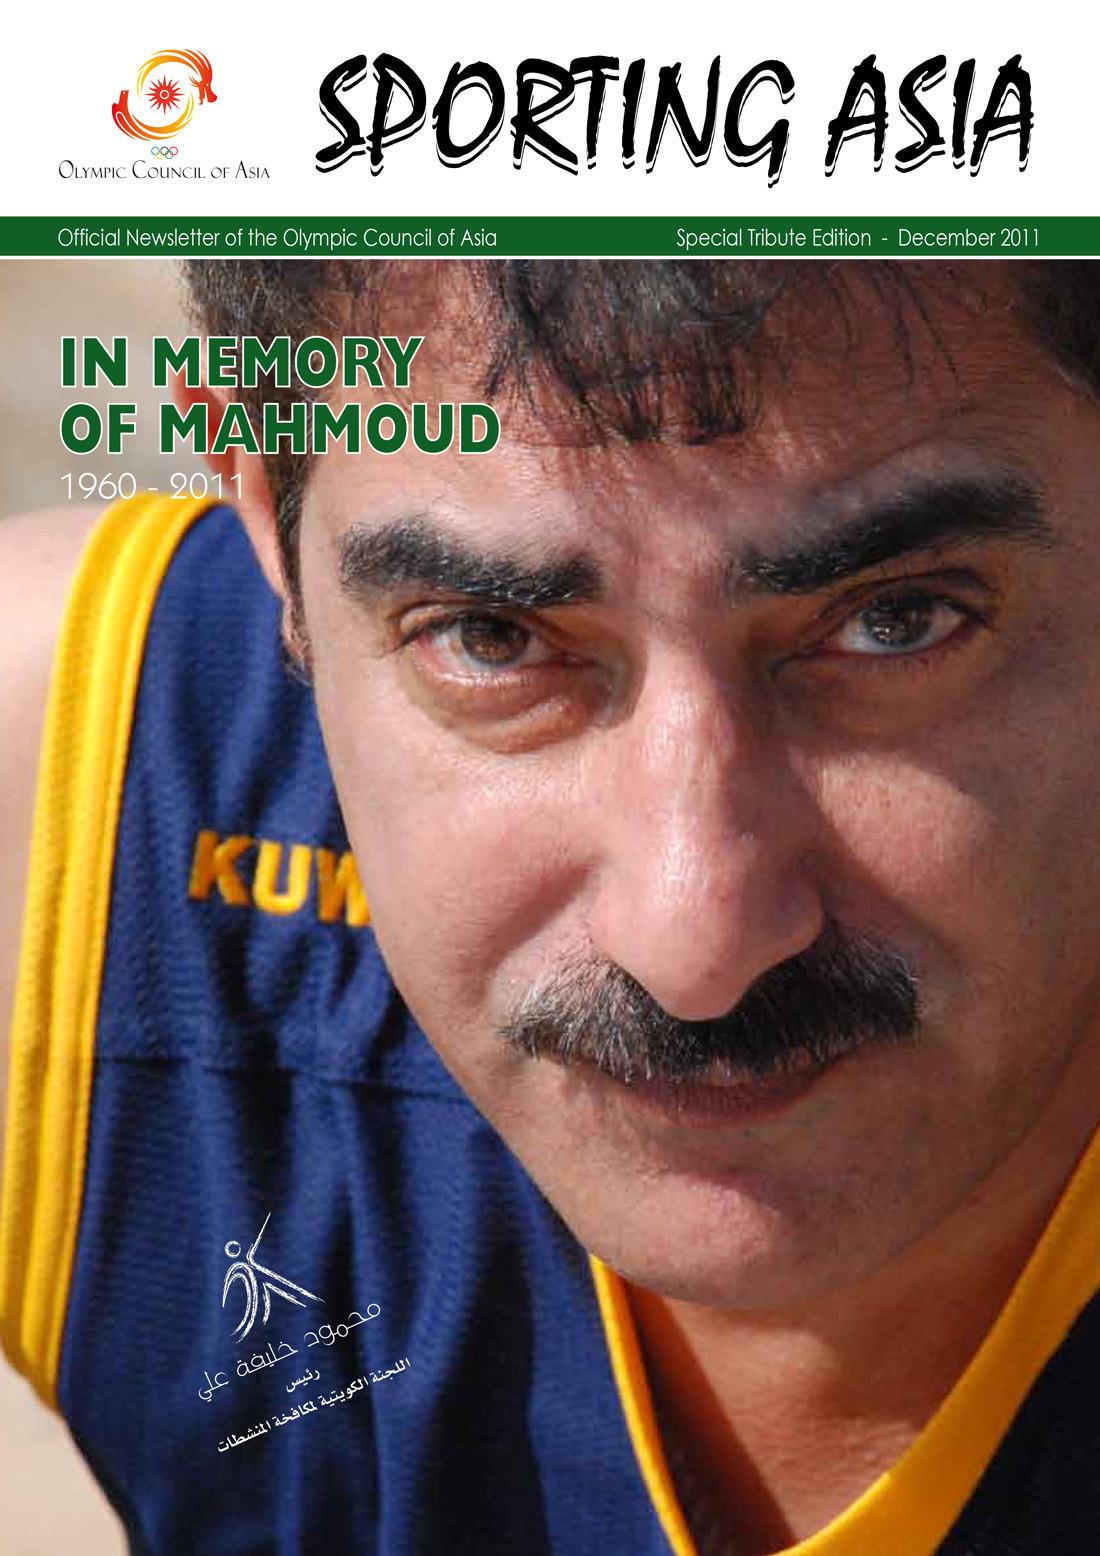 Sporting Asia - Edition 14 - DEC 2011